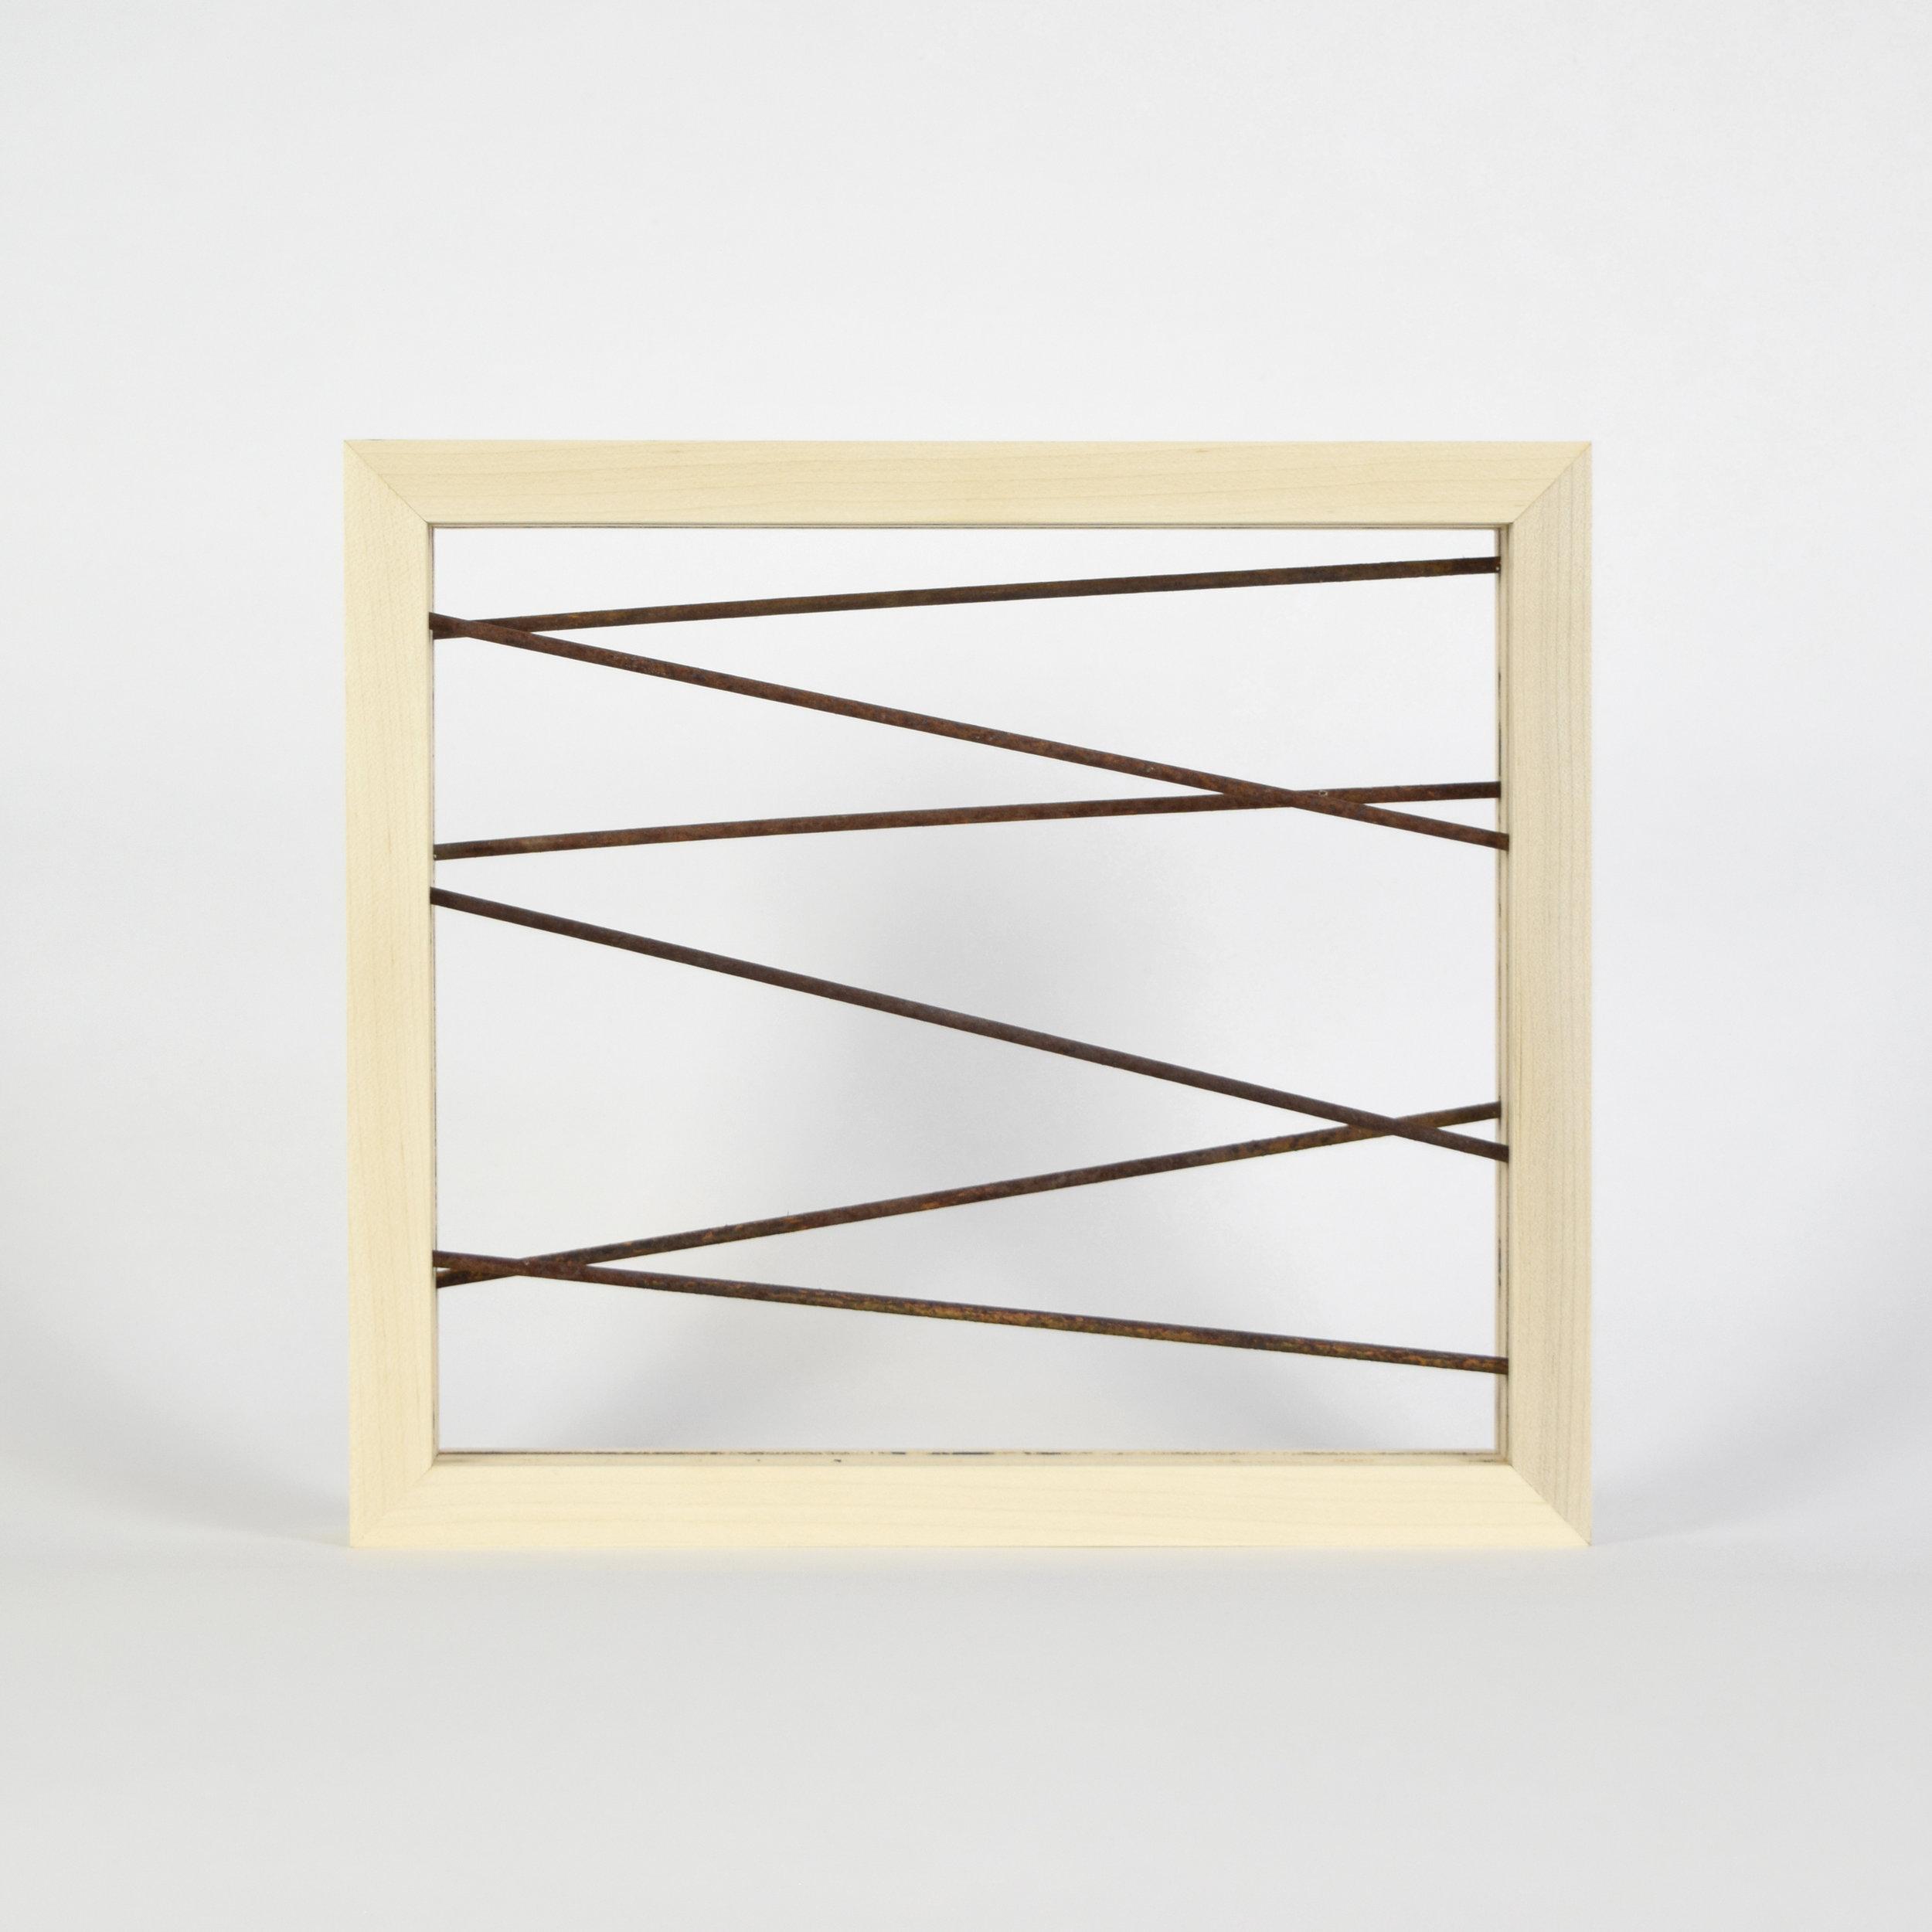 Wires, 10.5x12x2